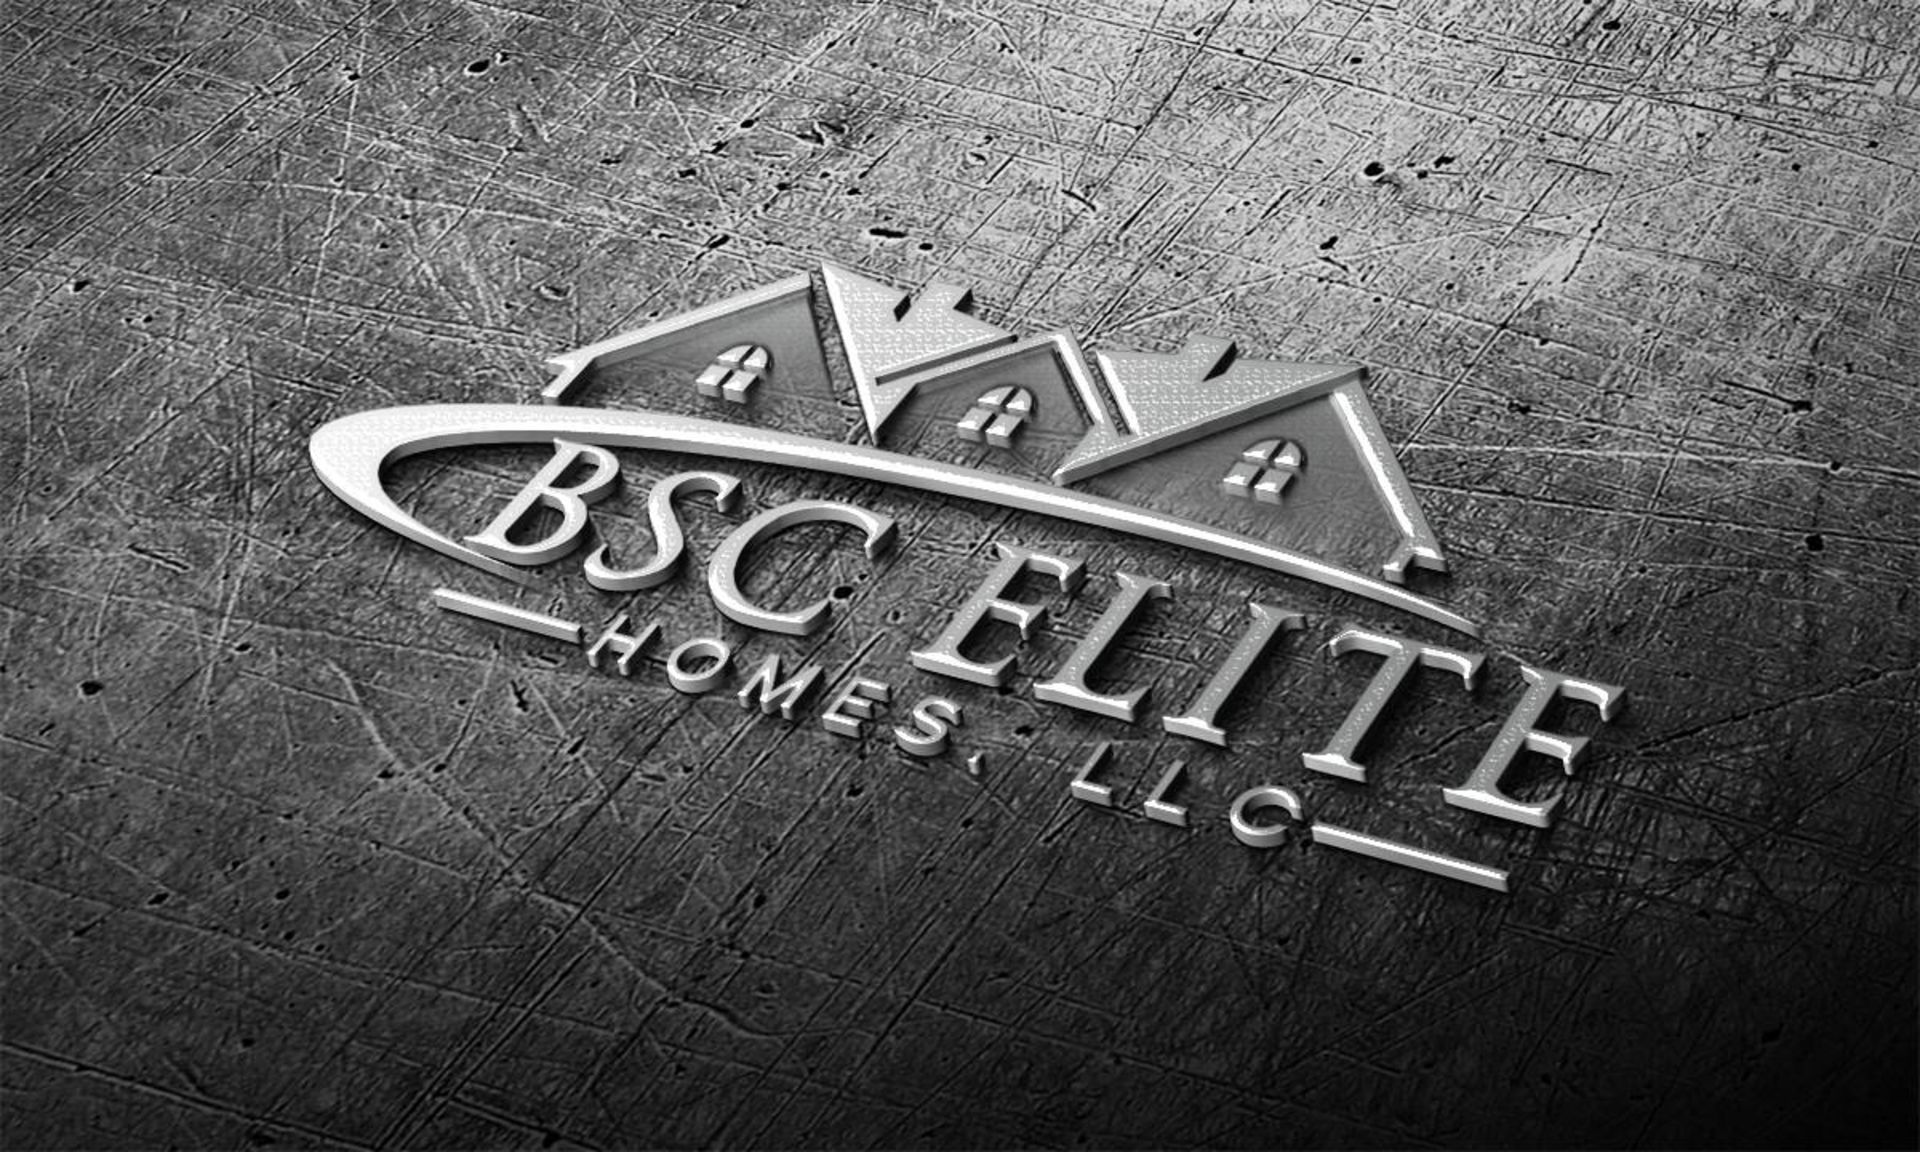 BSC Elite Homes LLC